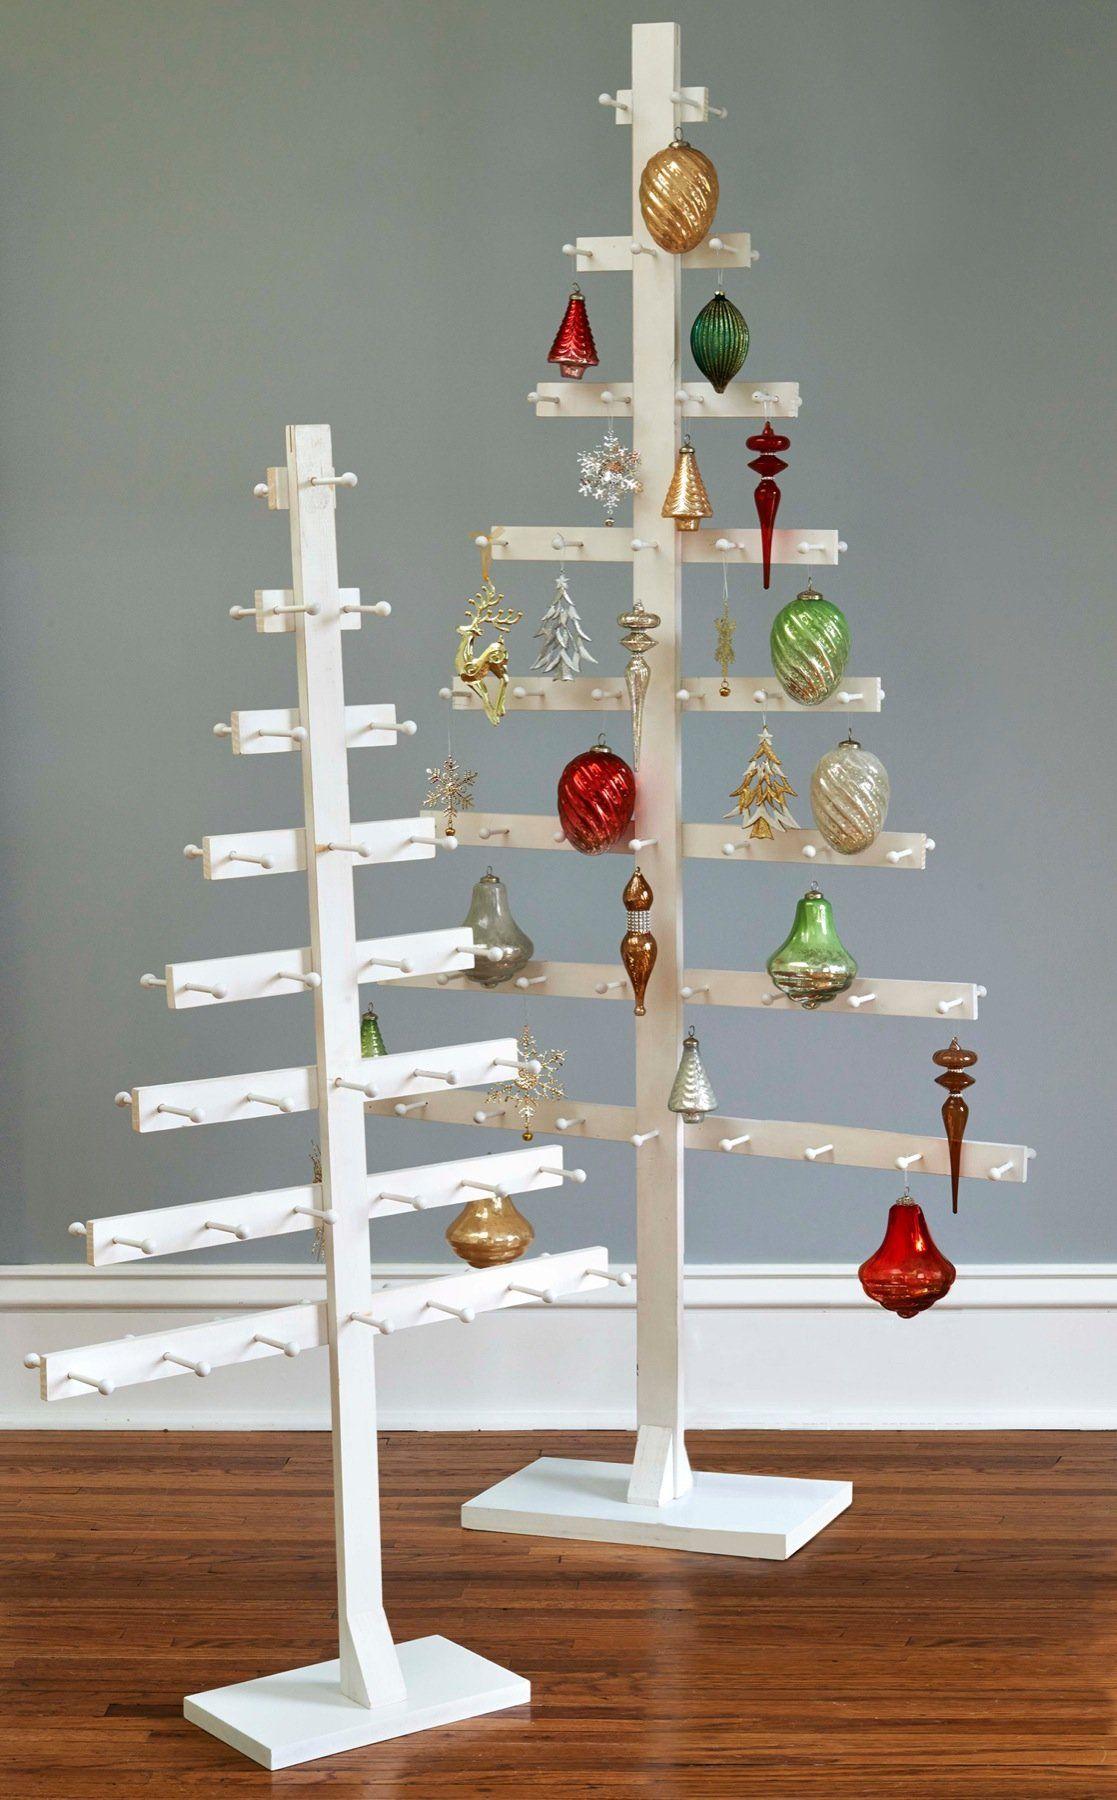 Merchandisers Coat Rack Slatted Display Tree With Header Card Ornament Tree Display Christmas Crafts Christmas Craft Fair